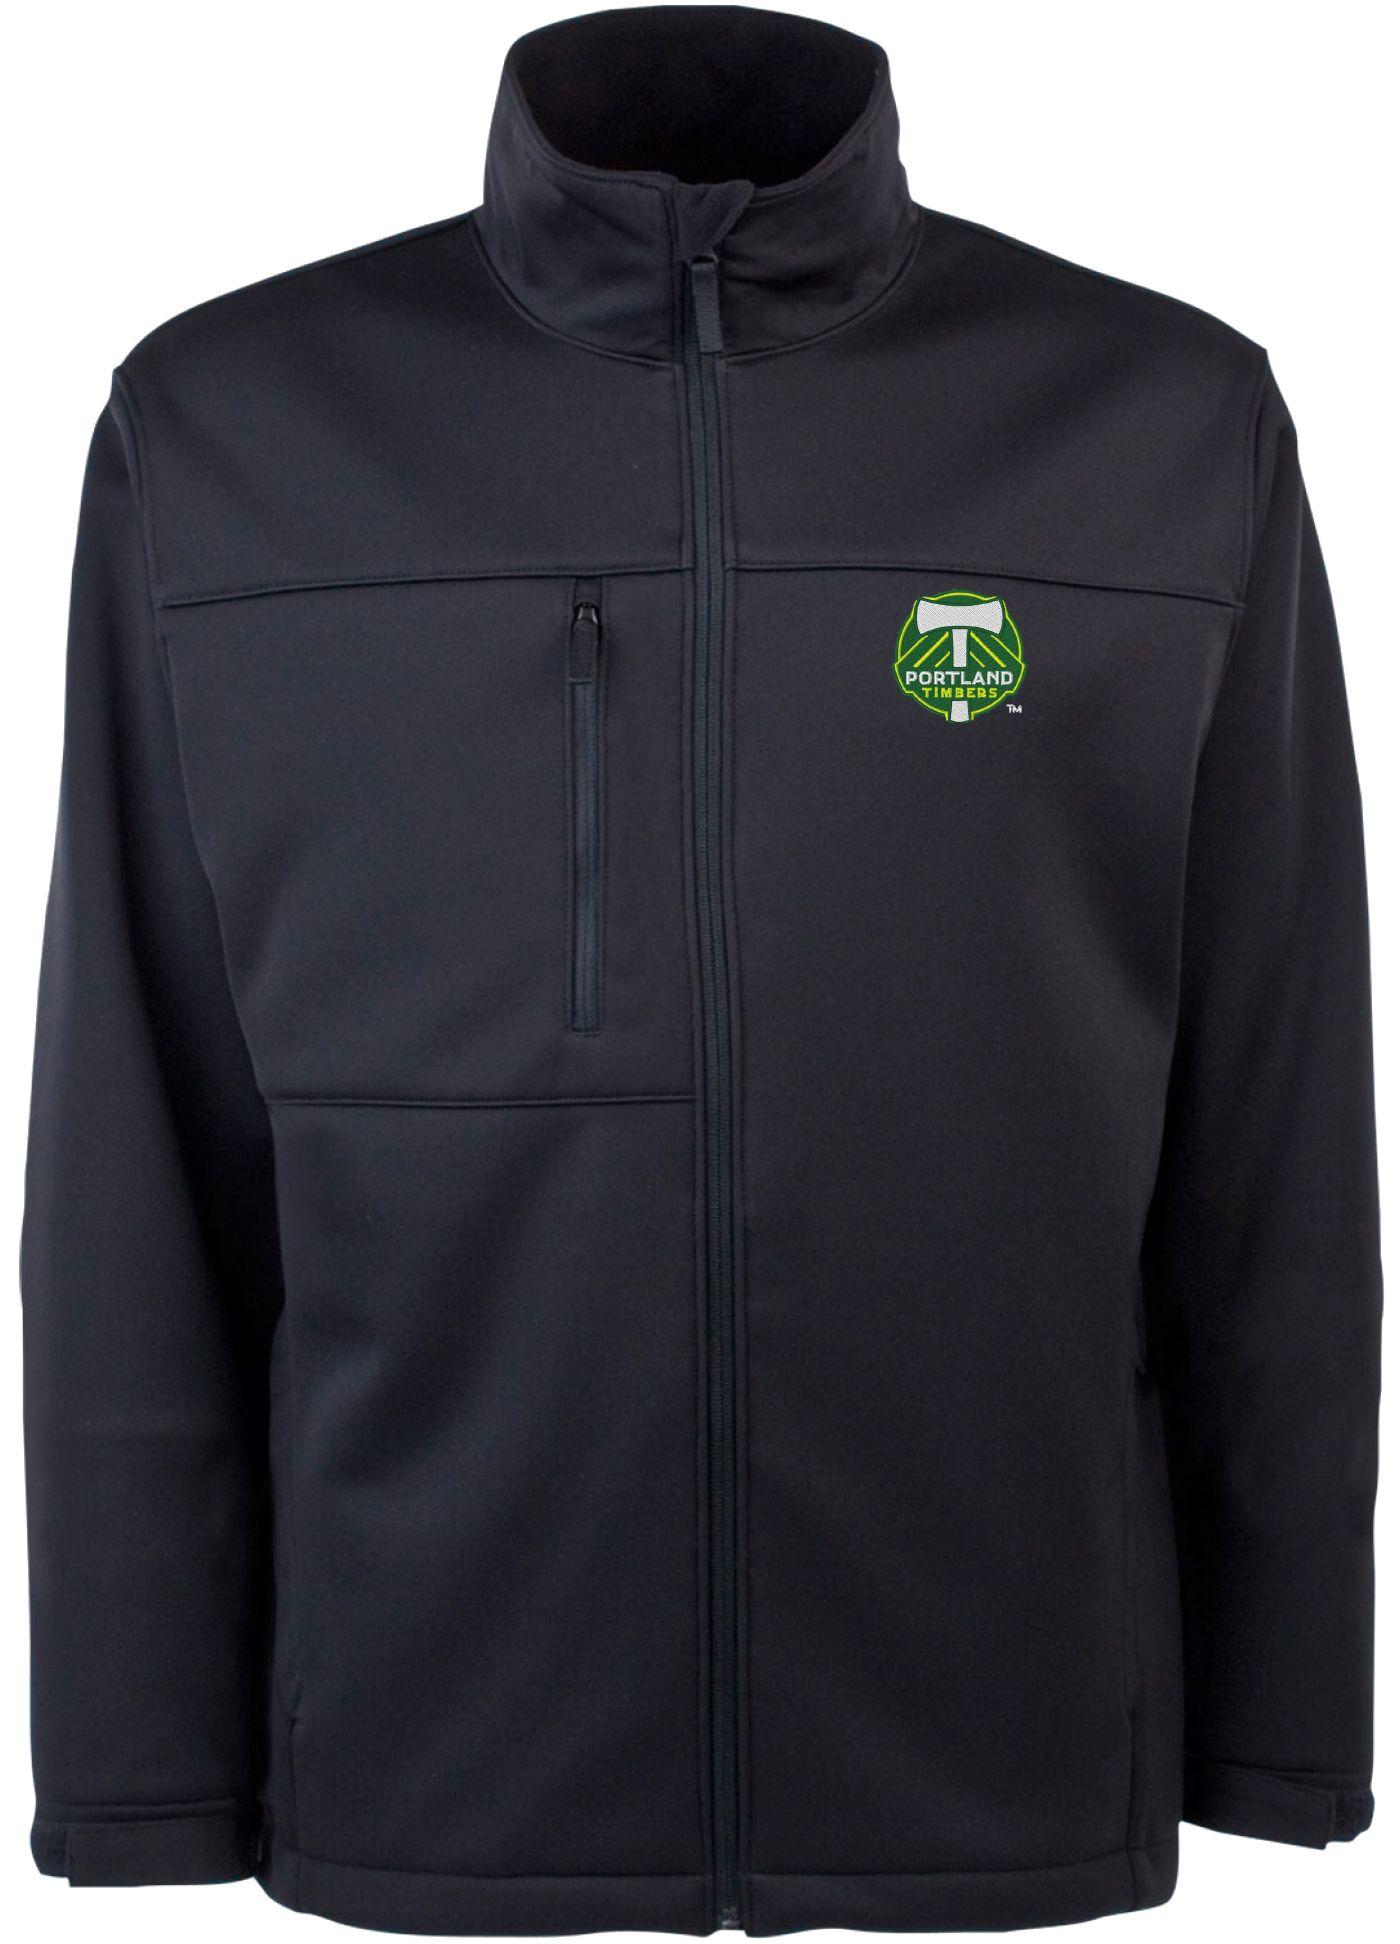 Antigua Men's Portland Timbers Traverse Black Soft-Shell Full-Zip Jacket